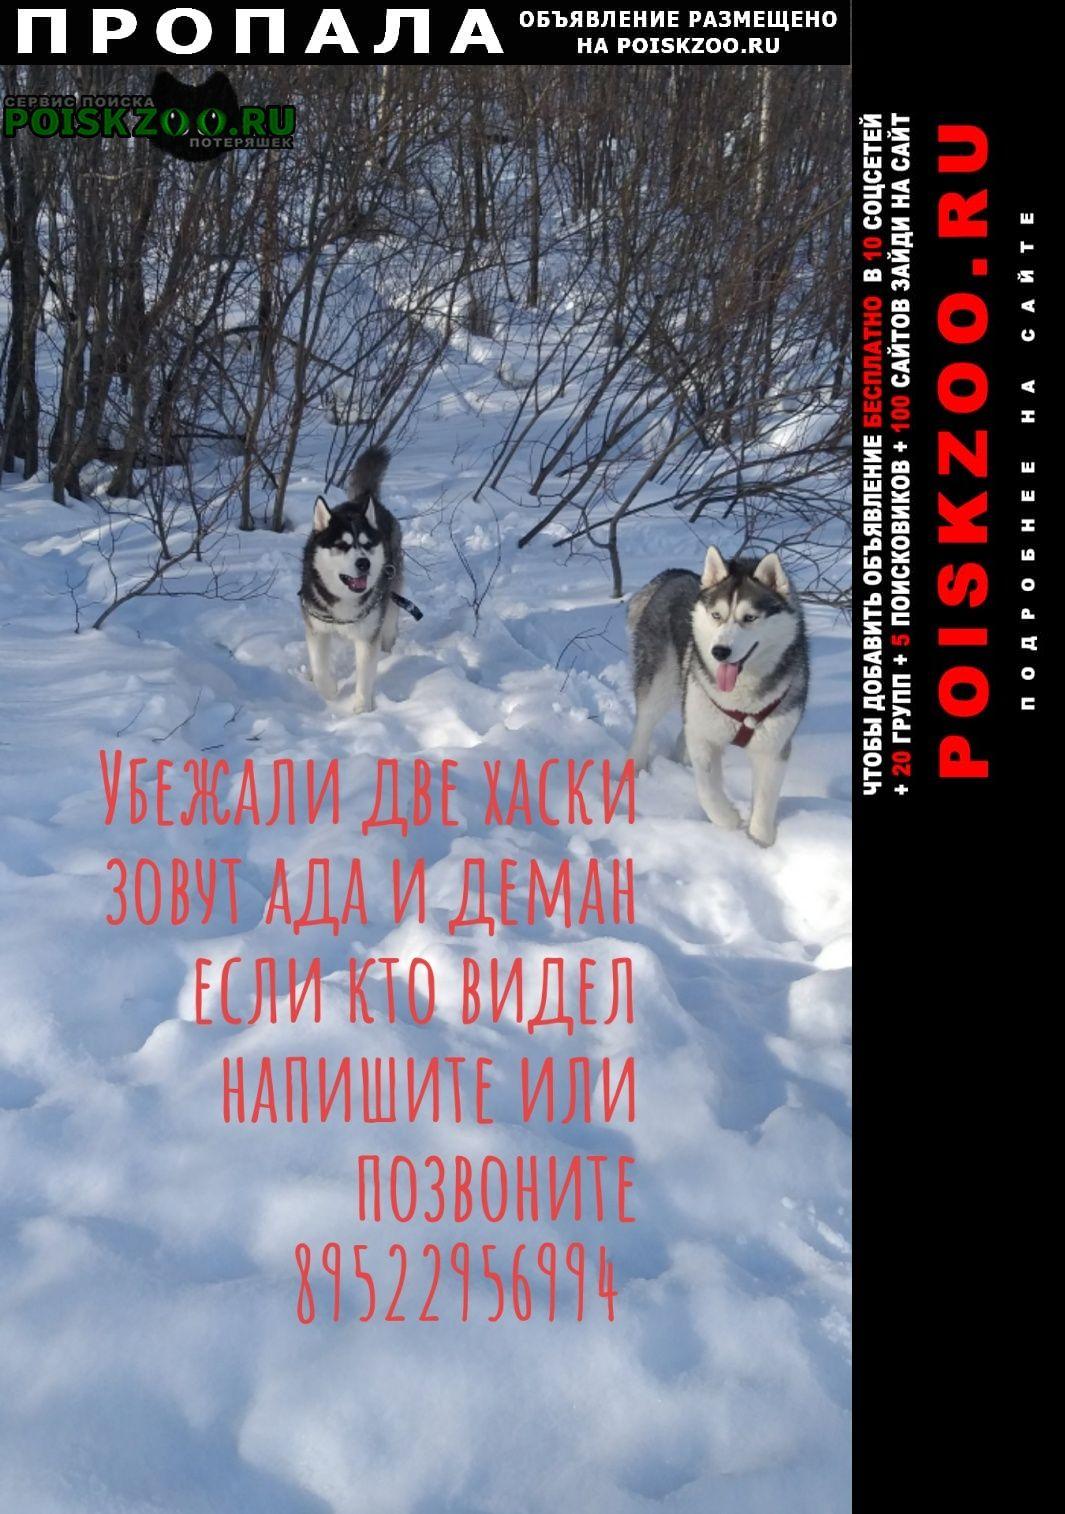 Пропала собака и 2 хаски Мурманск